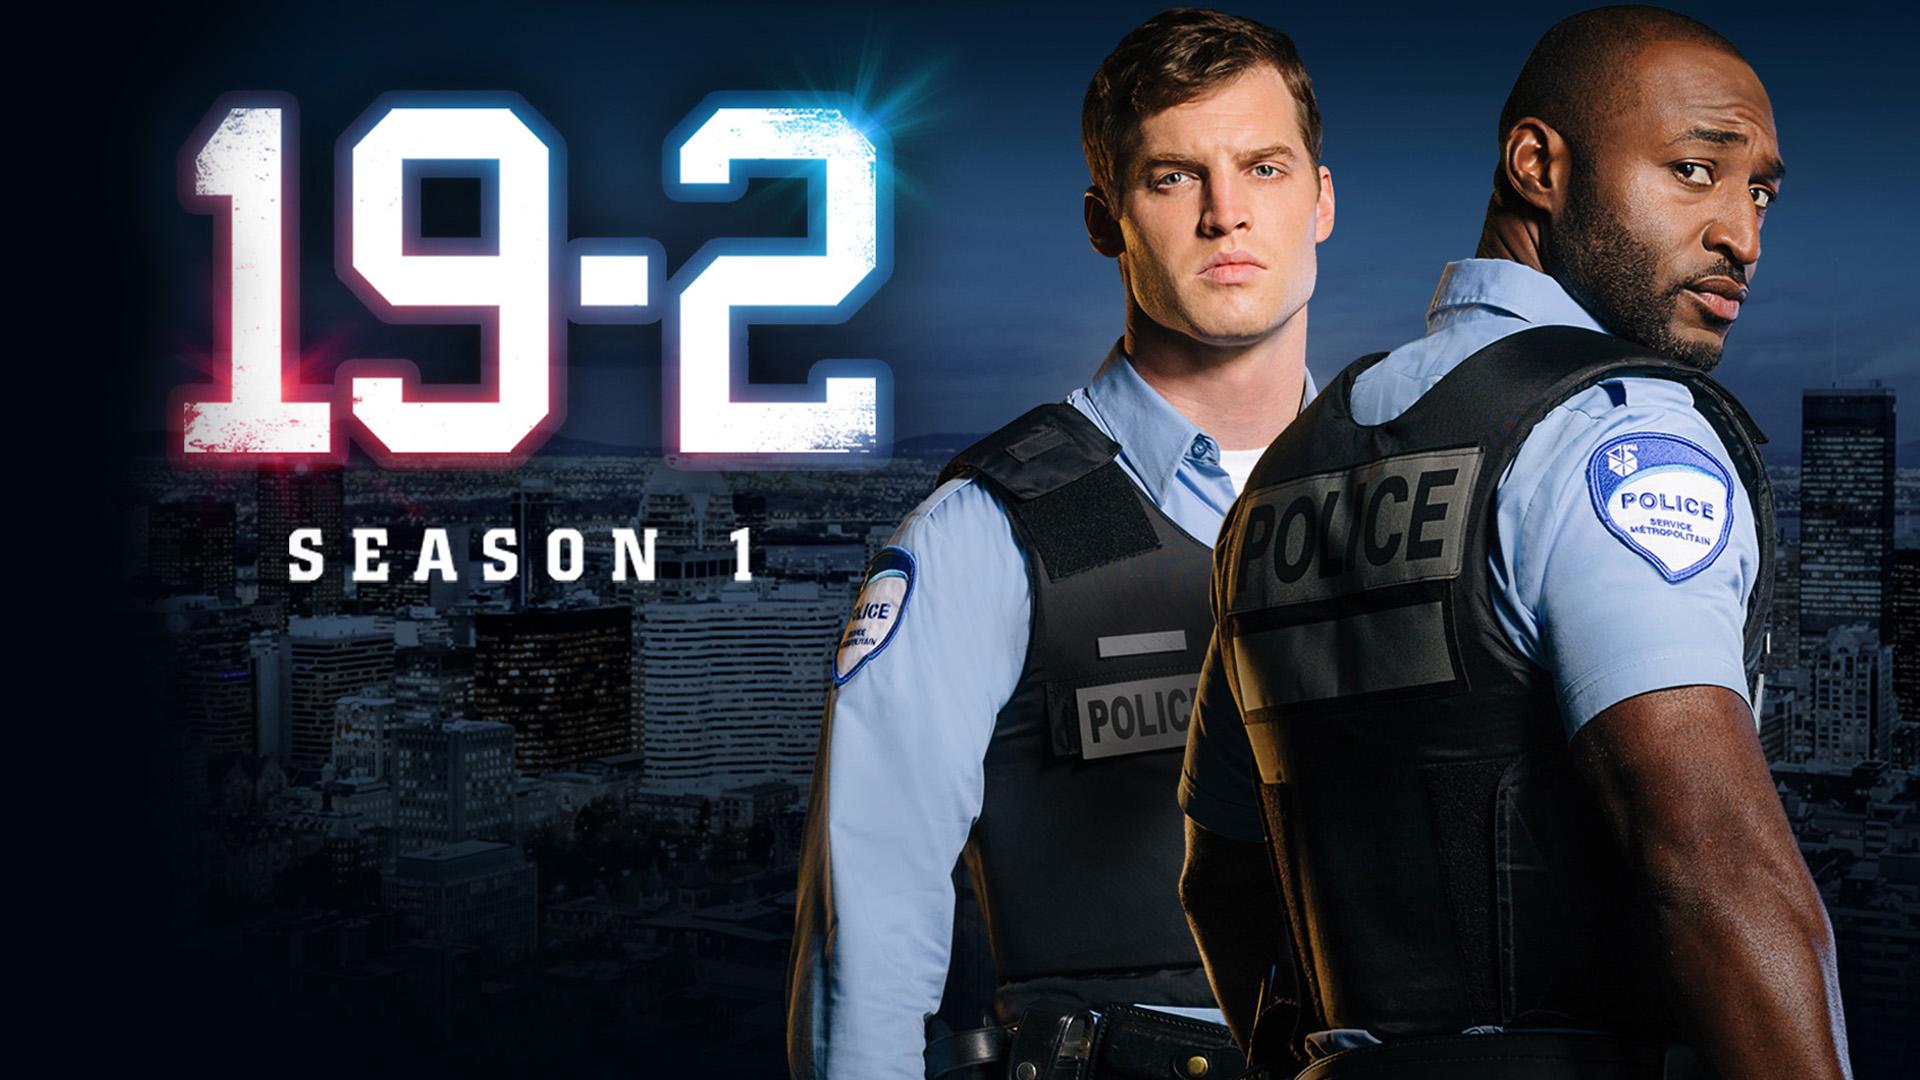 19-2 - Season 1